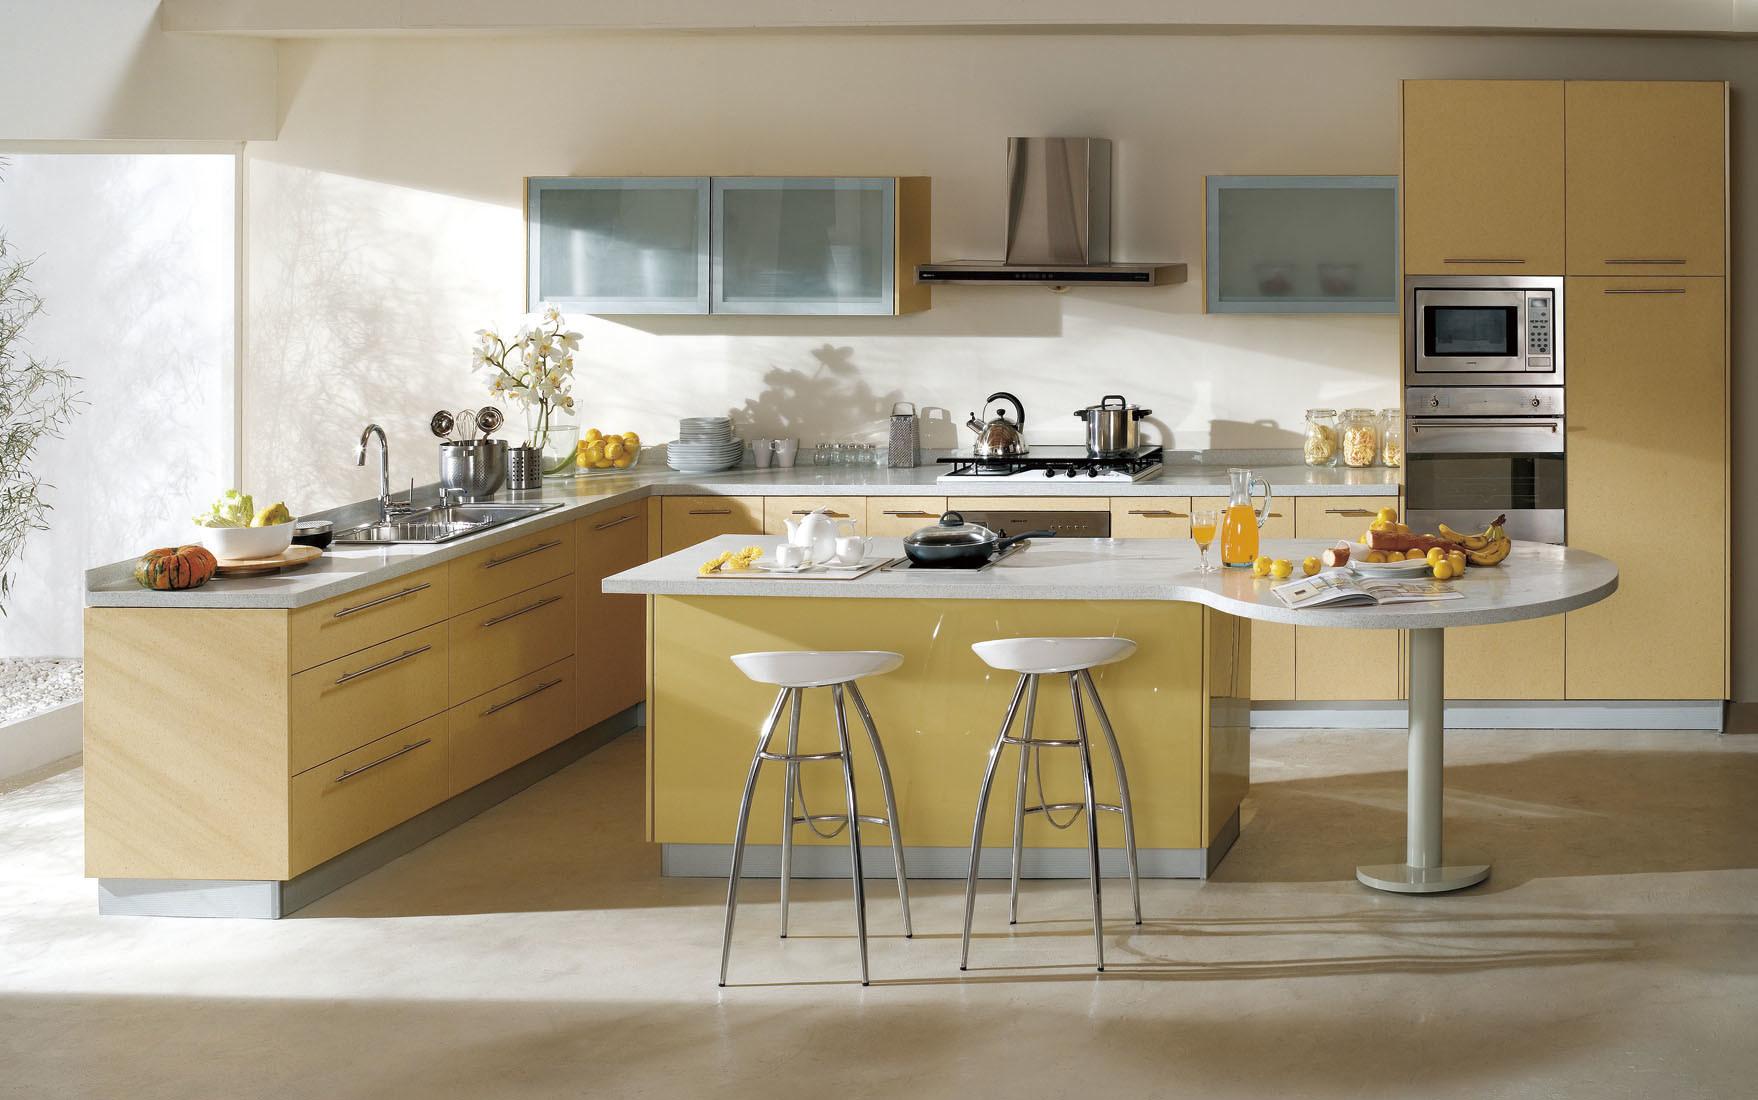 Muebles Cocina Modernos Fotos Cocina Muebles De Cocina Modernos  # Muebles Cocina Nigran